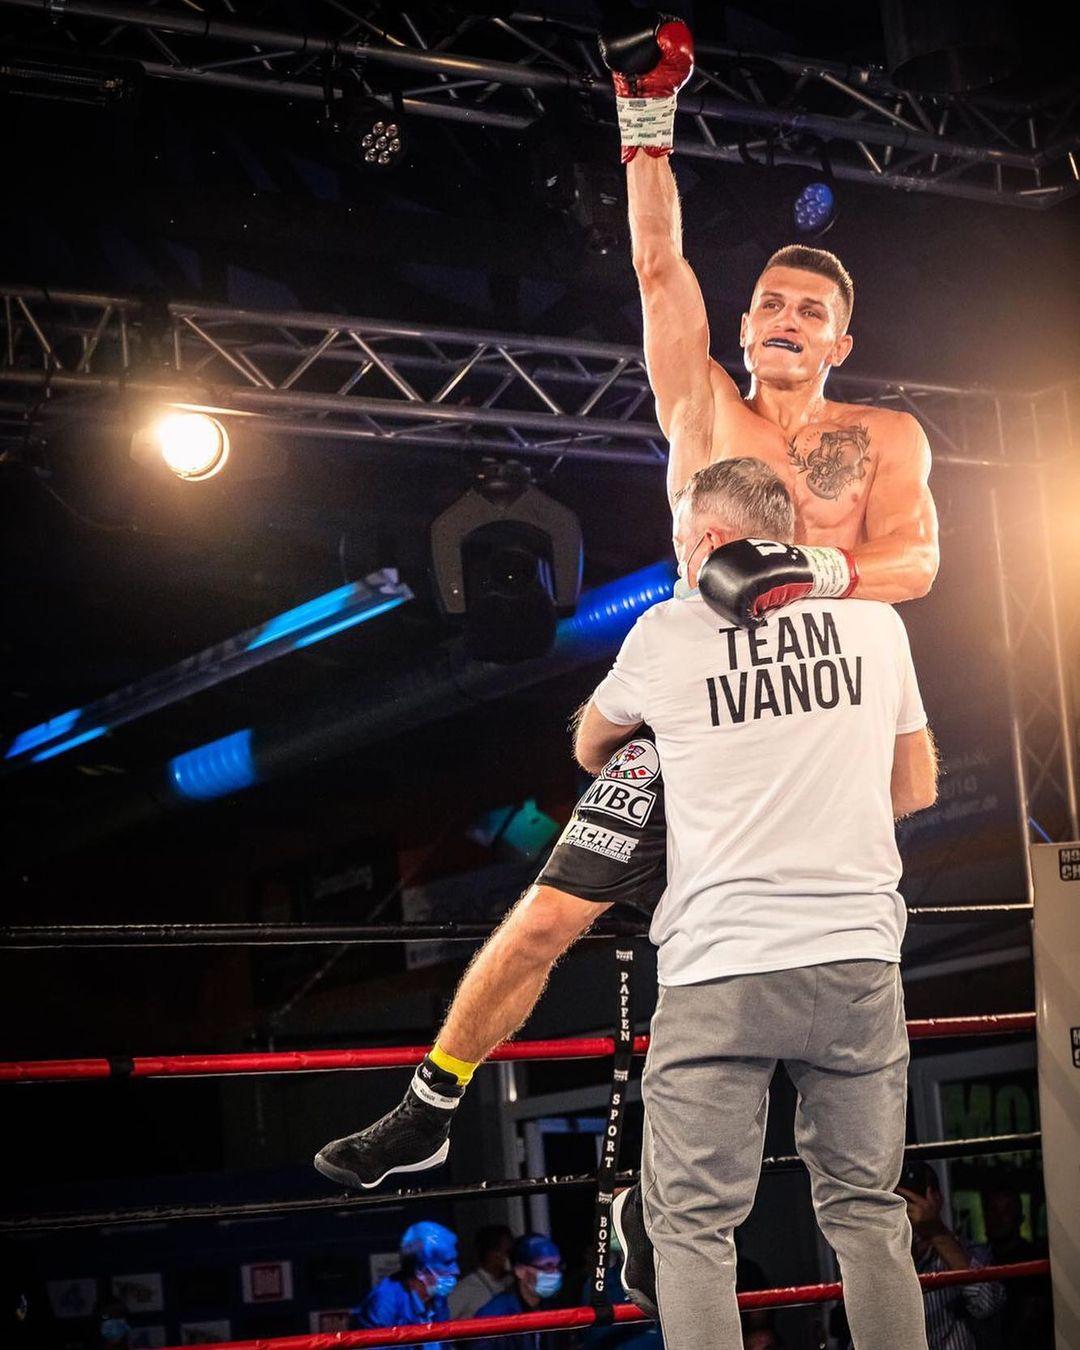 Andrii Velikovskyi & José de Jesus Macias fight to a draw in Germany   Boxen247.com (Kristian von Sponneck)